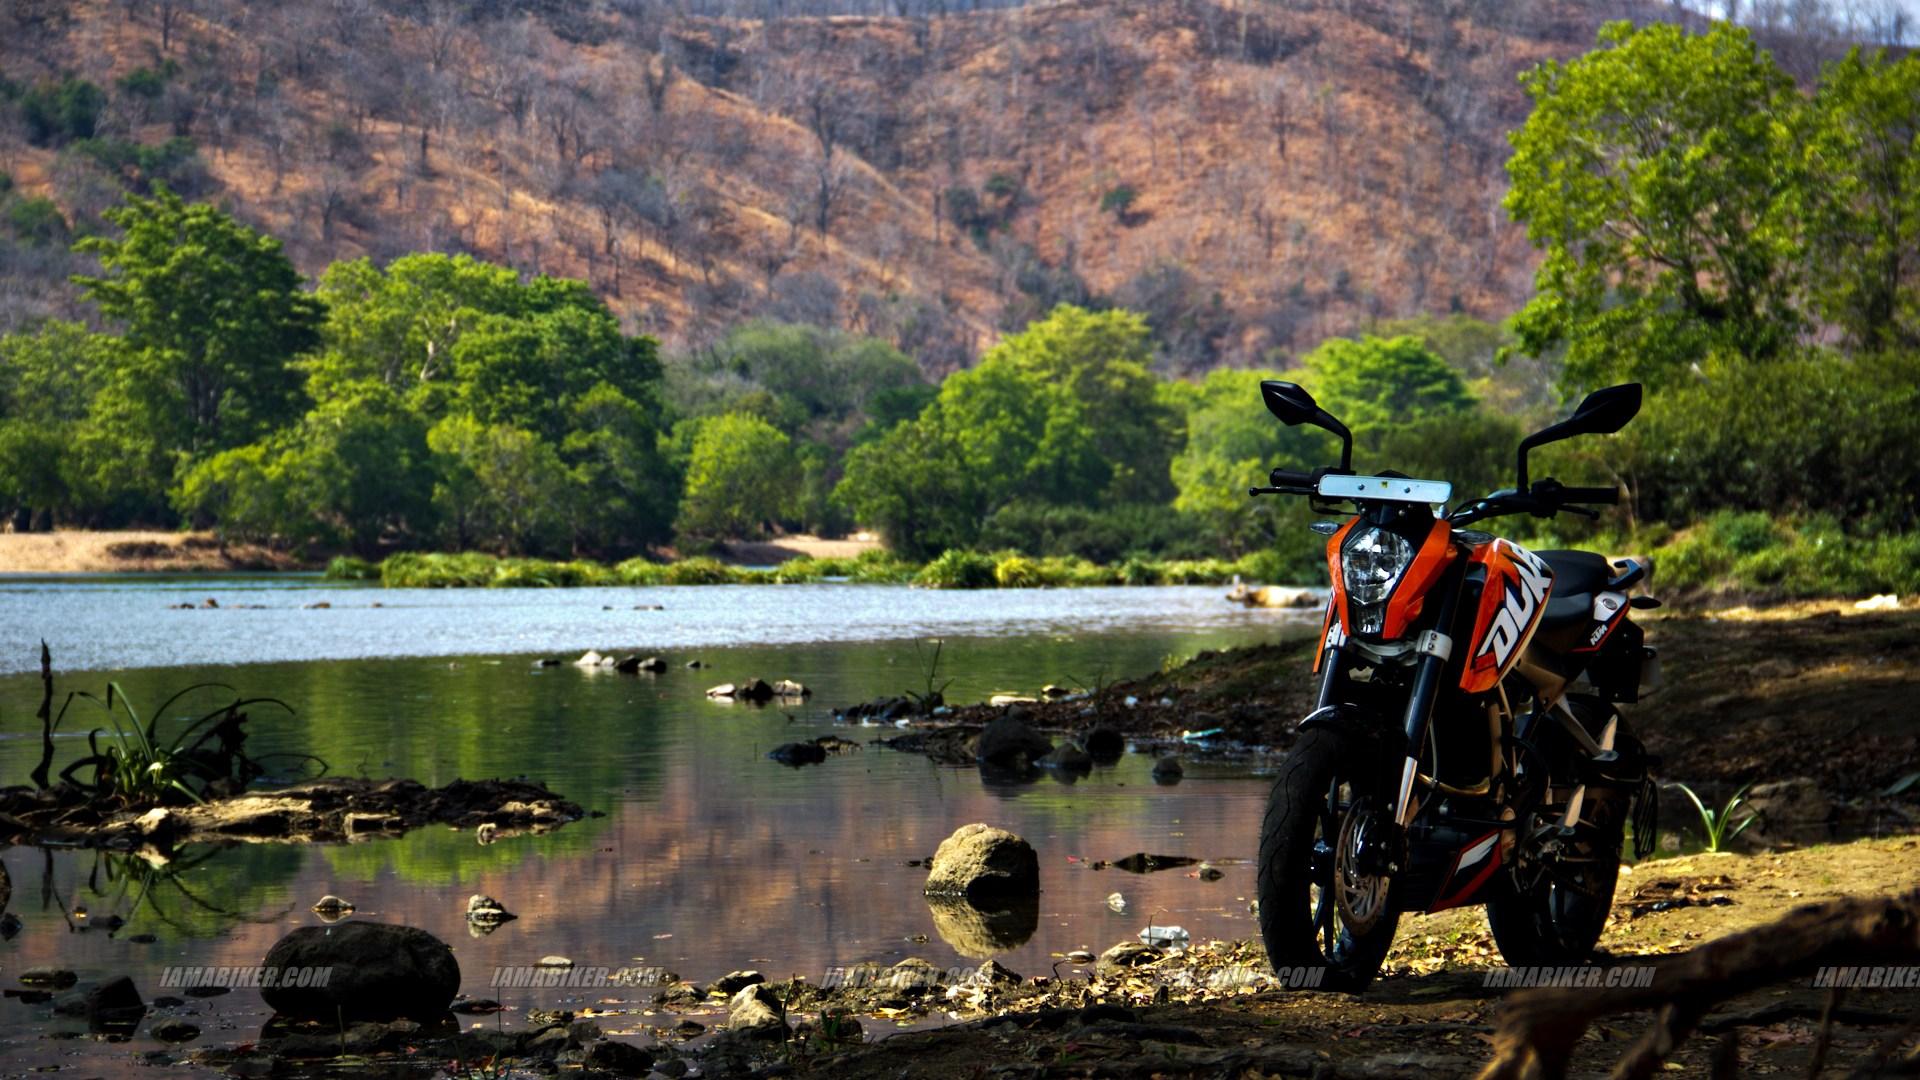 KTM Duke 200 HD wallpapers 1920x1080